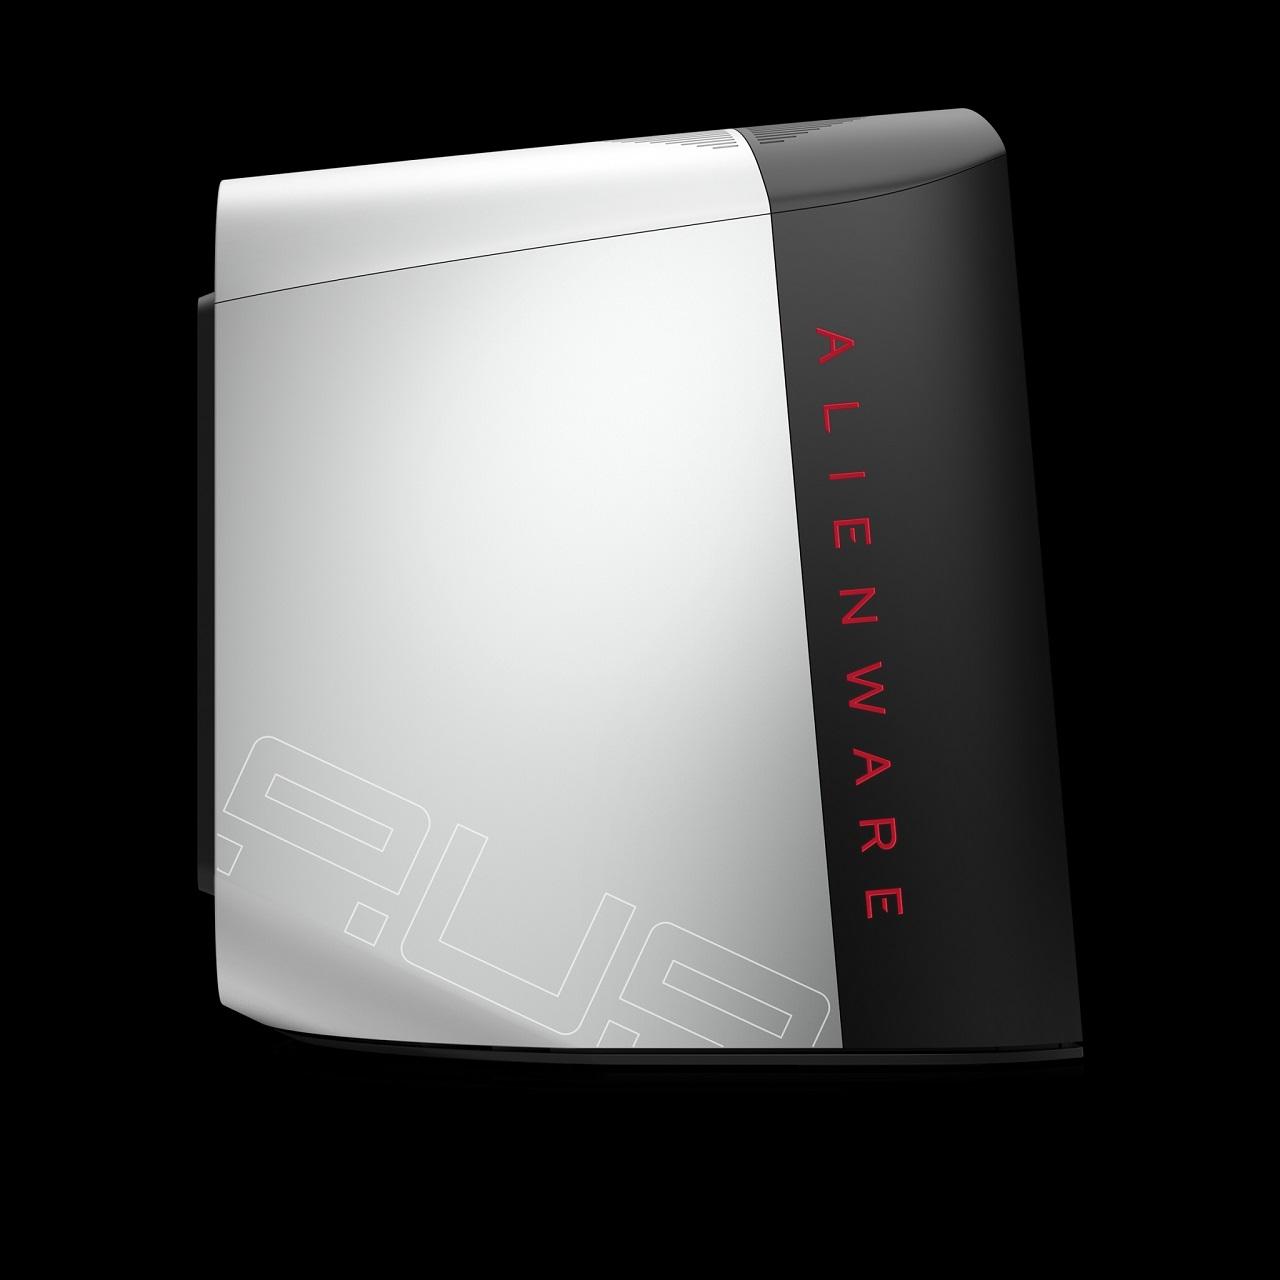 Dell has unveiled the Alienware Aurora R9 desktop at Gamescom 2019 13